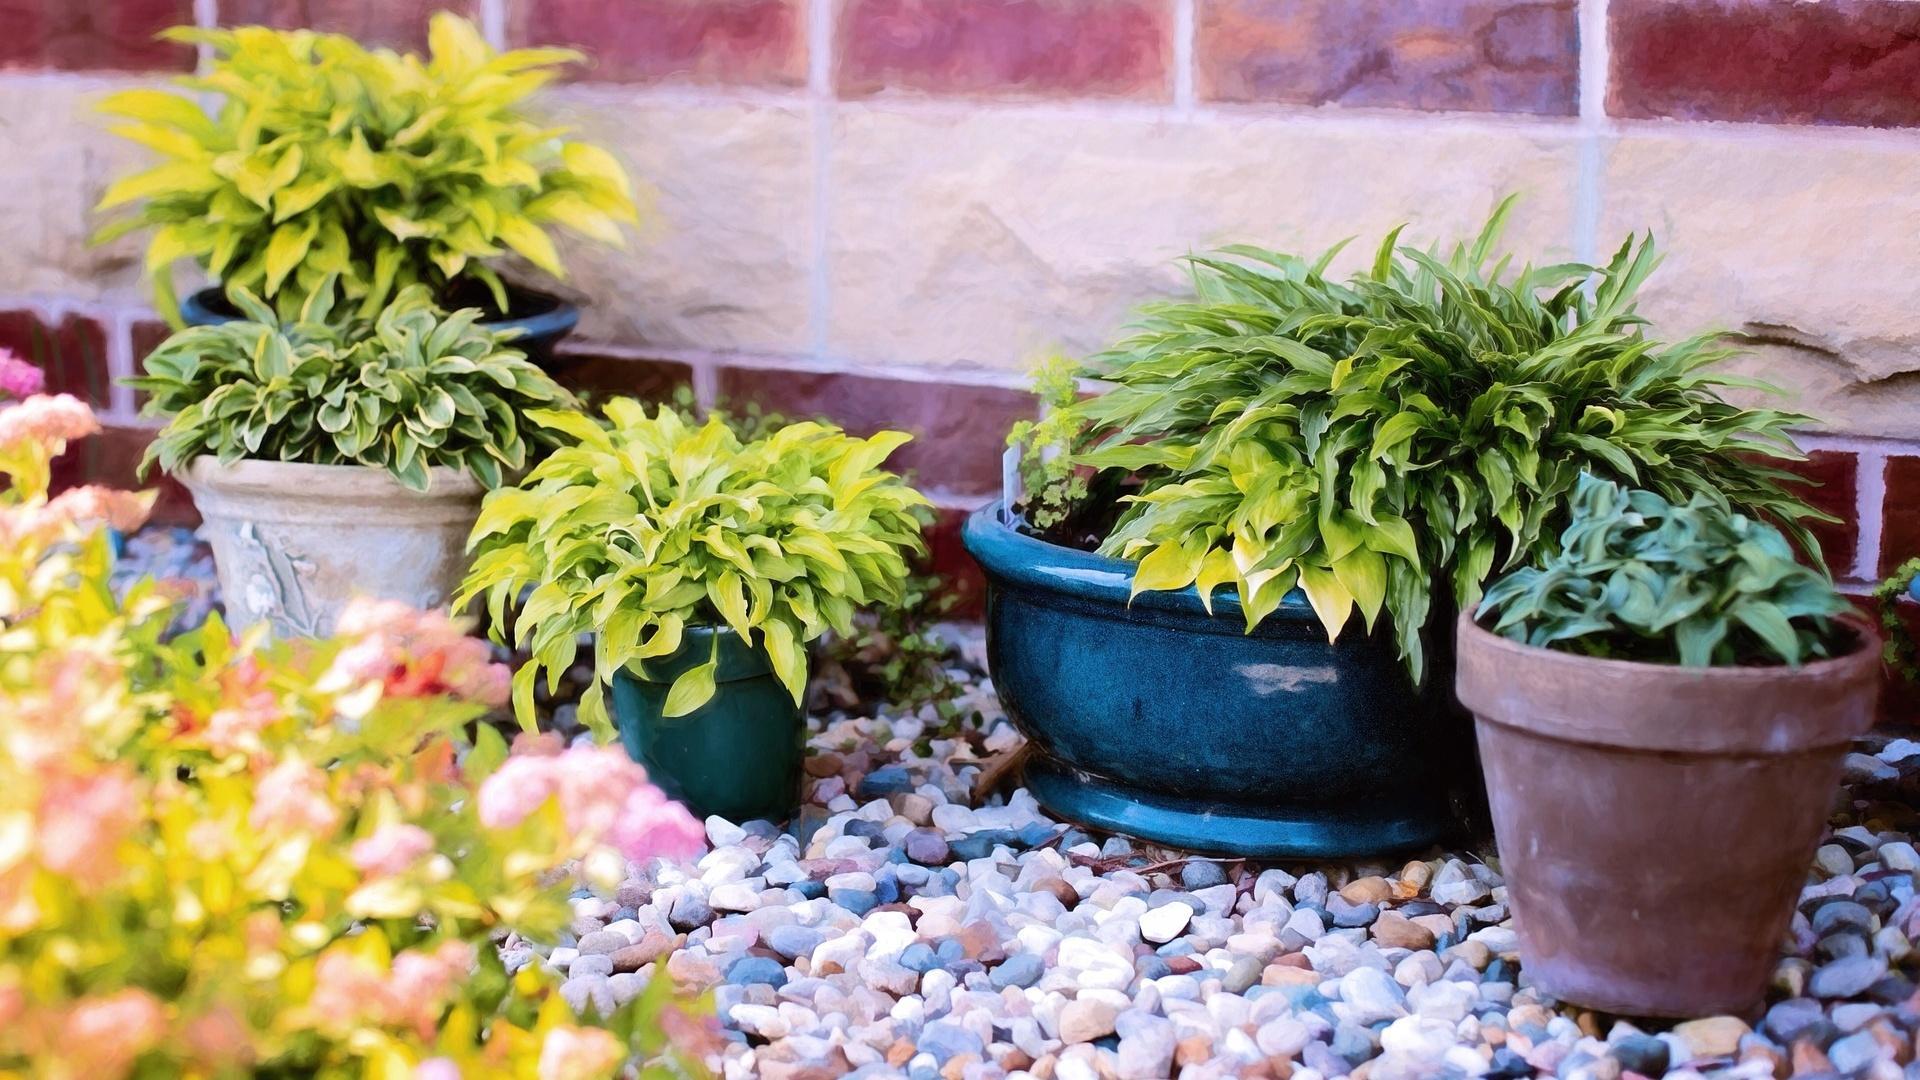 Milben in Blumenerde: So gehen Sie dagegen vor